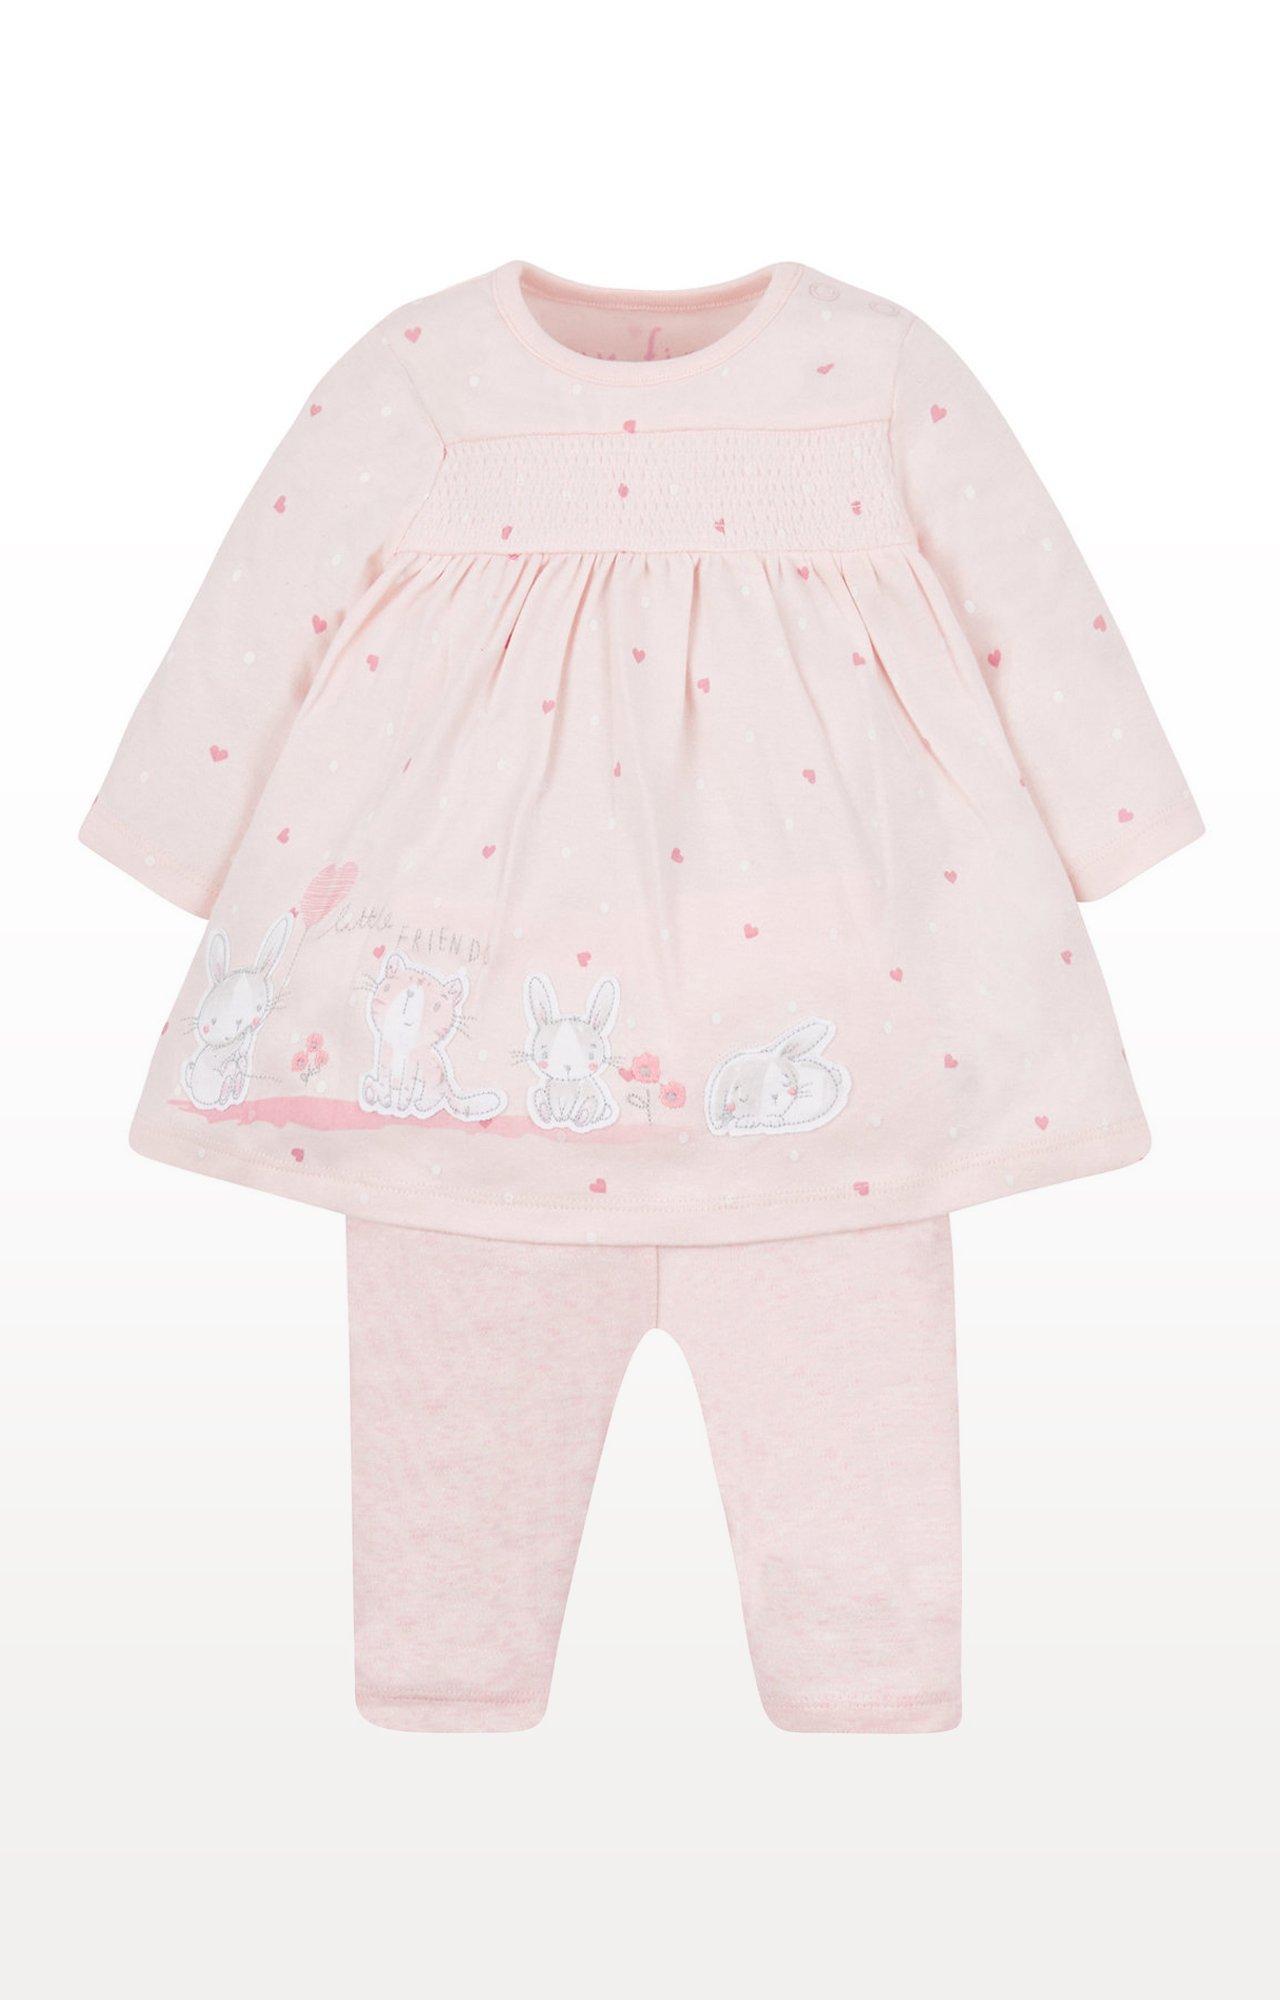 Mothercare | Pink Printed Top and Pant Set